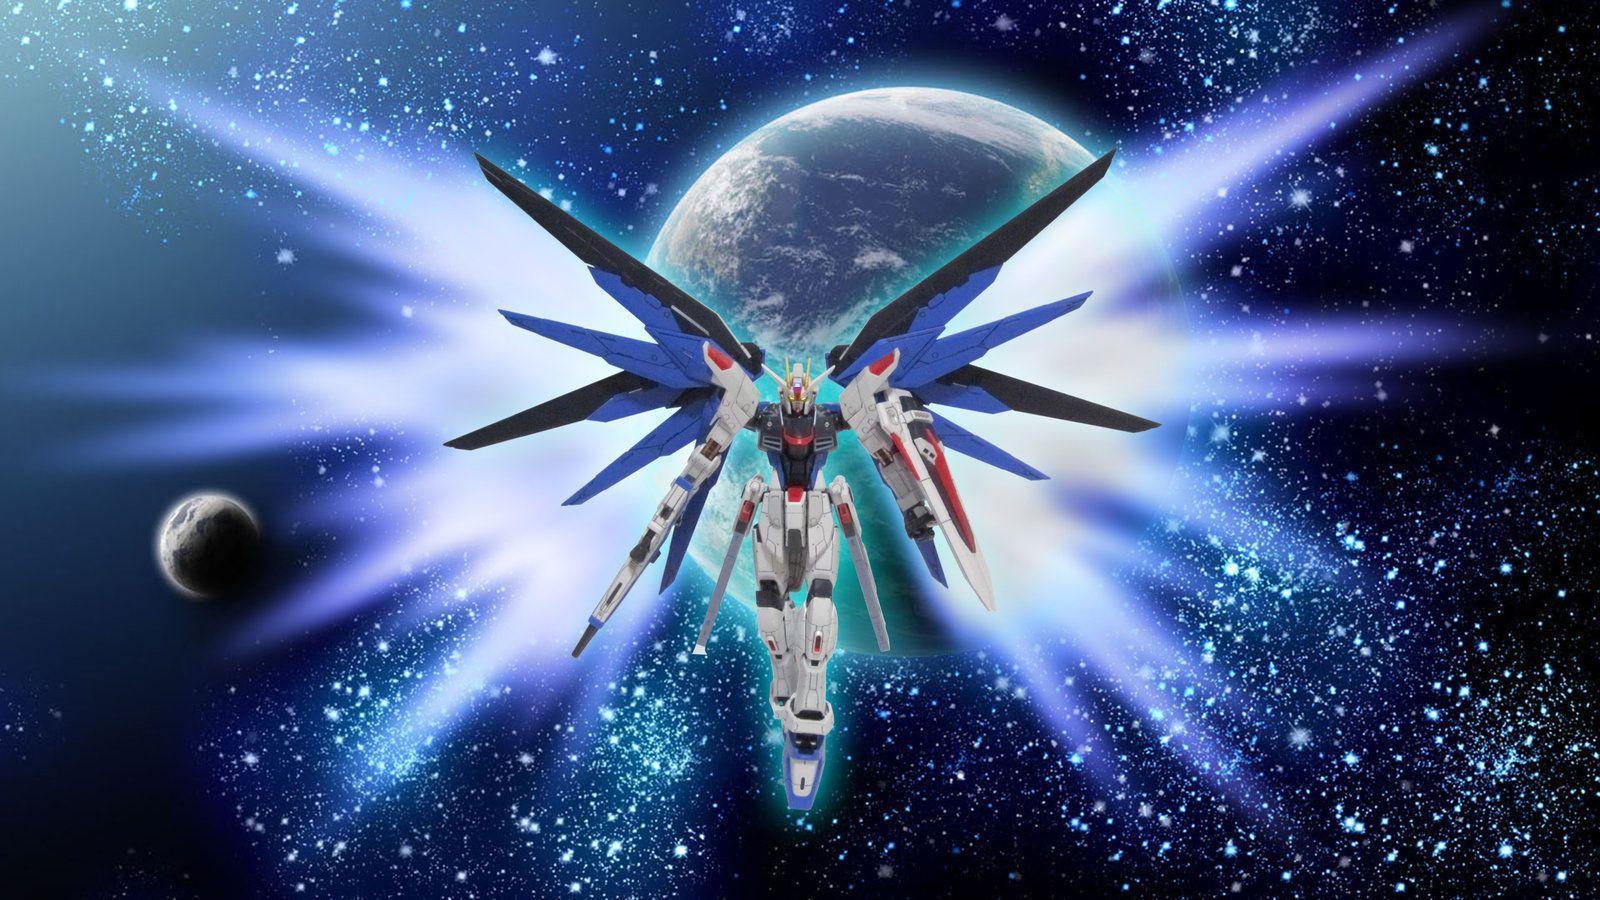 Gundam seed destiny wallpaper freedom